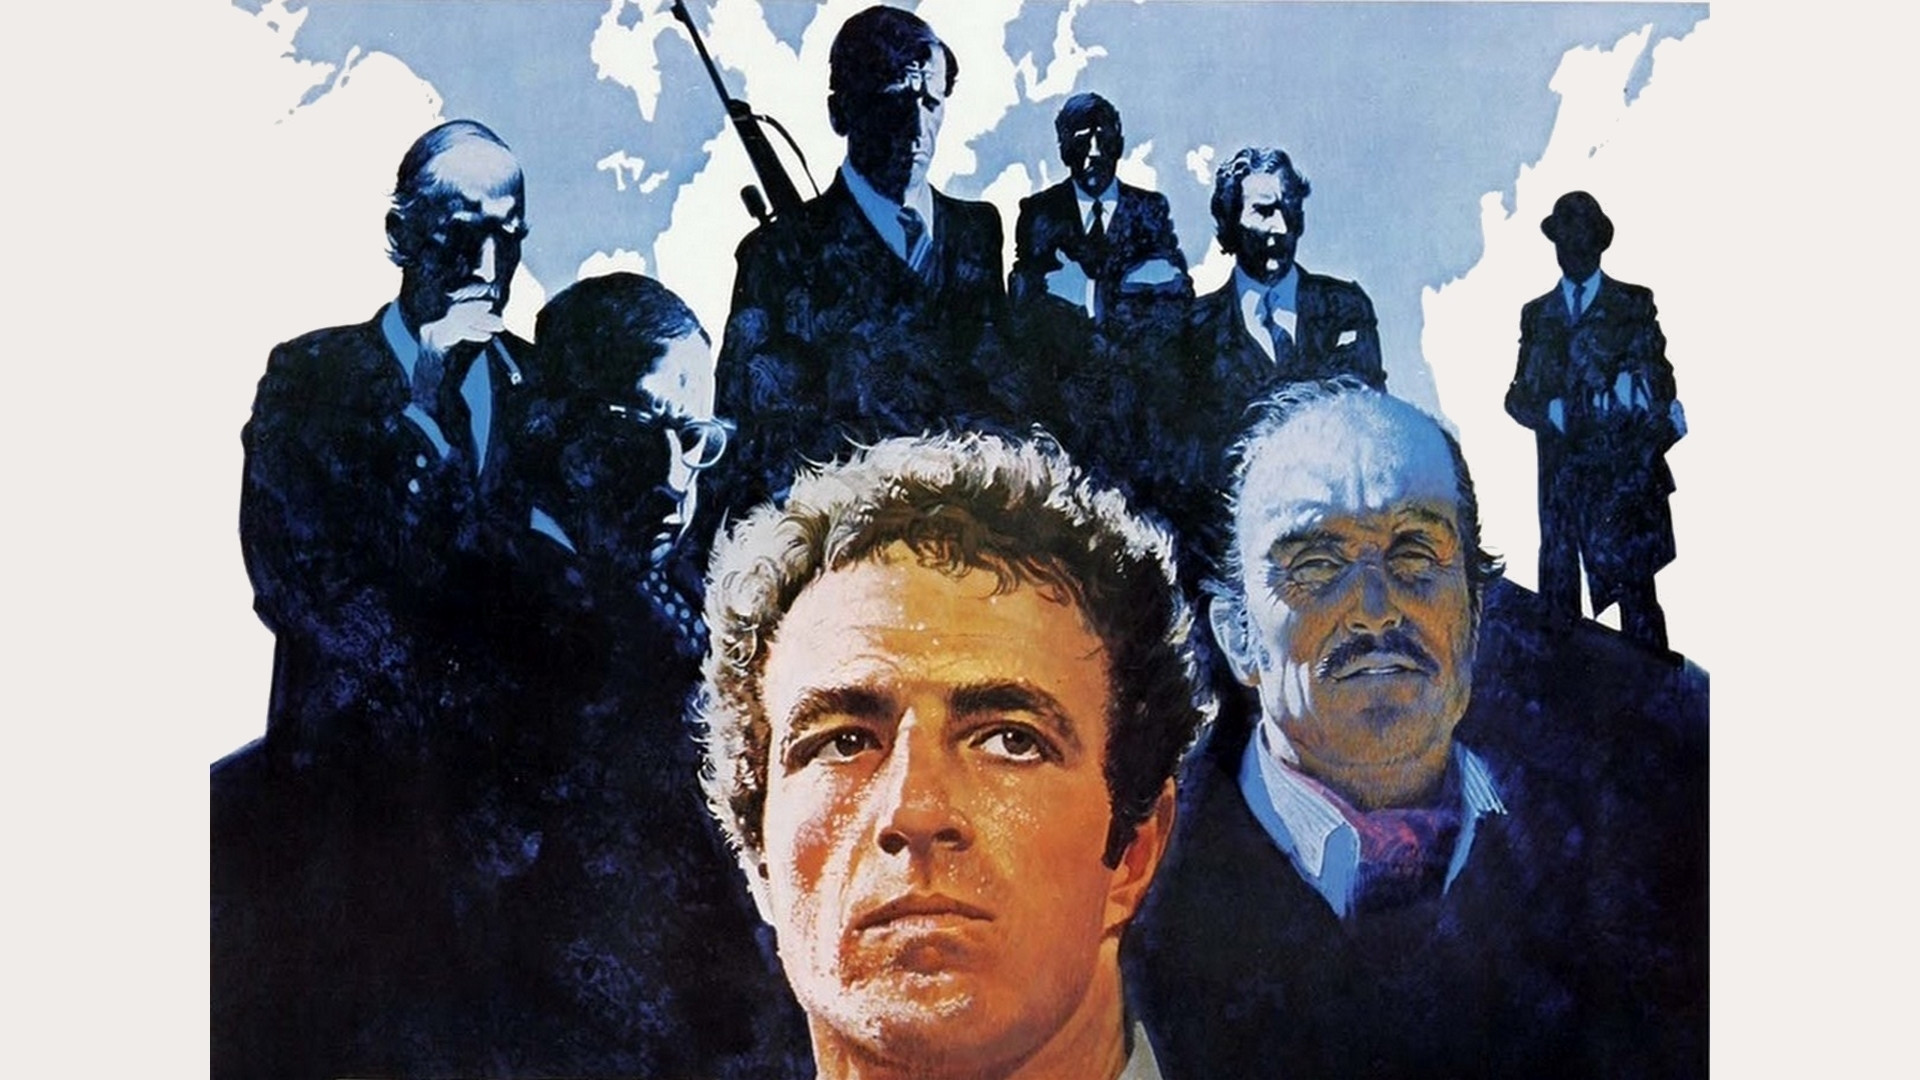 The Killer Elite (1975) – Action, Crime, Thriller